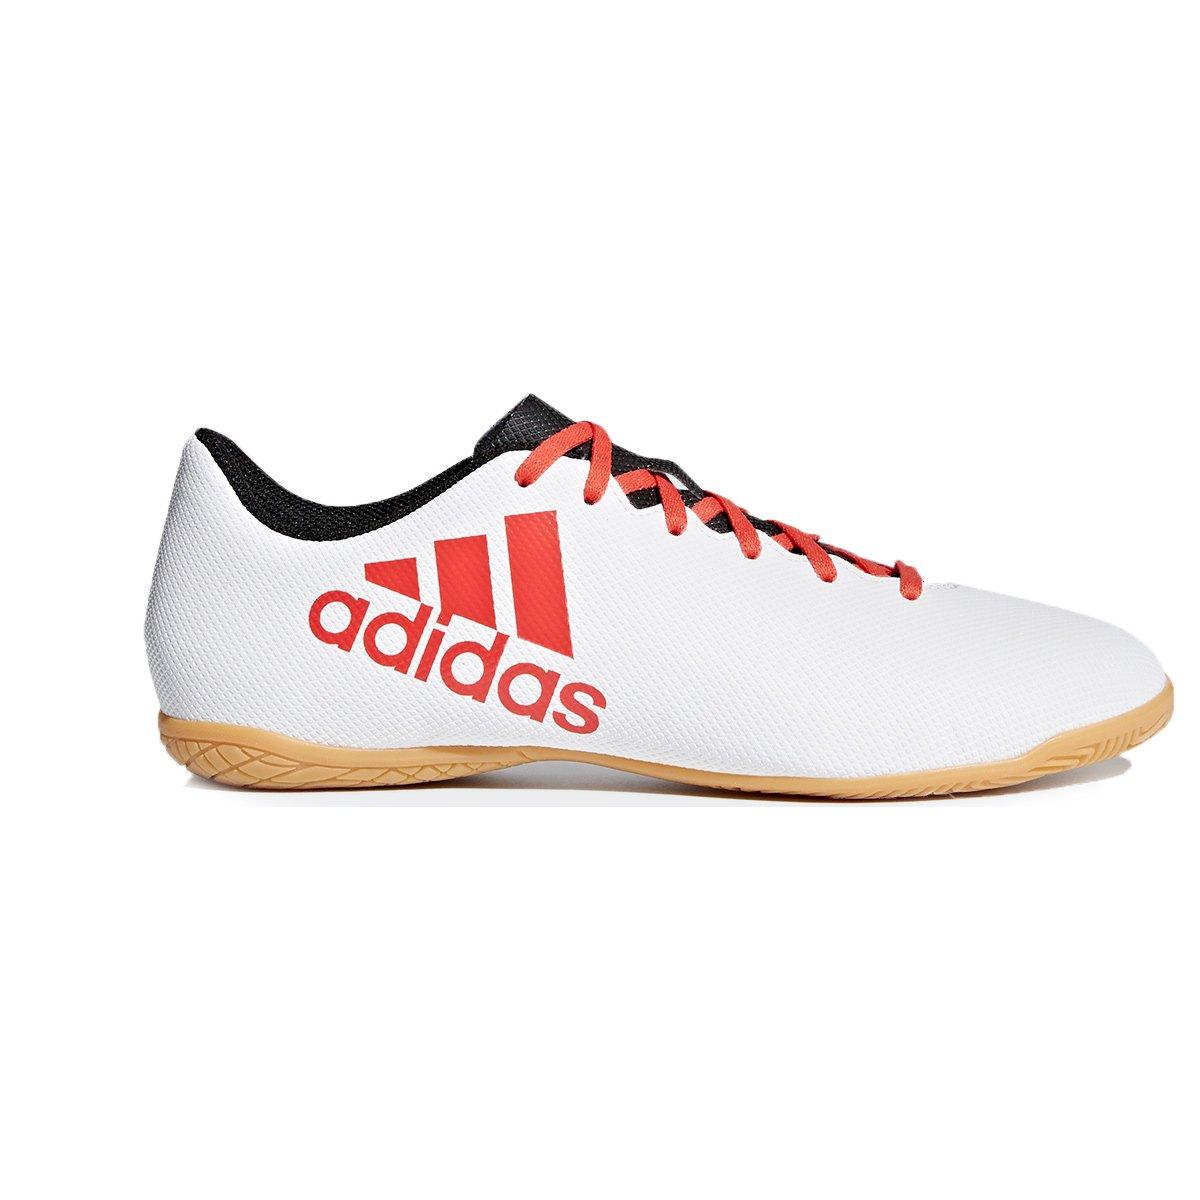 2d28c35085 Chuteira Futsal Adidas X 17.4 IN